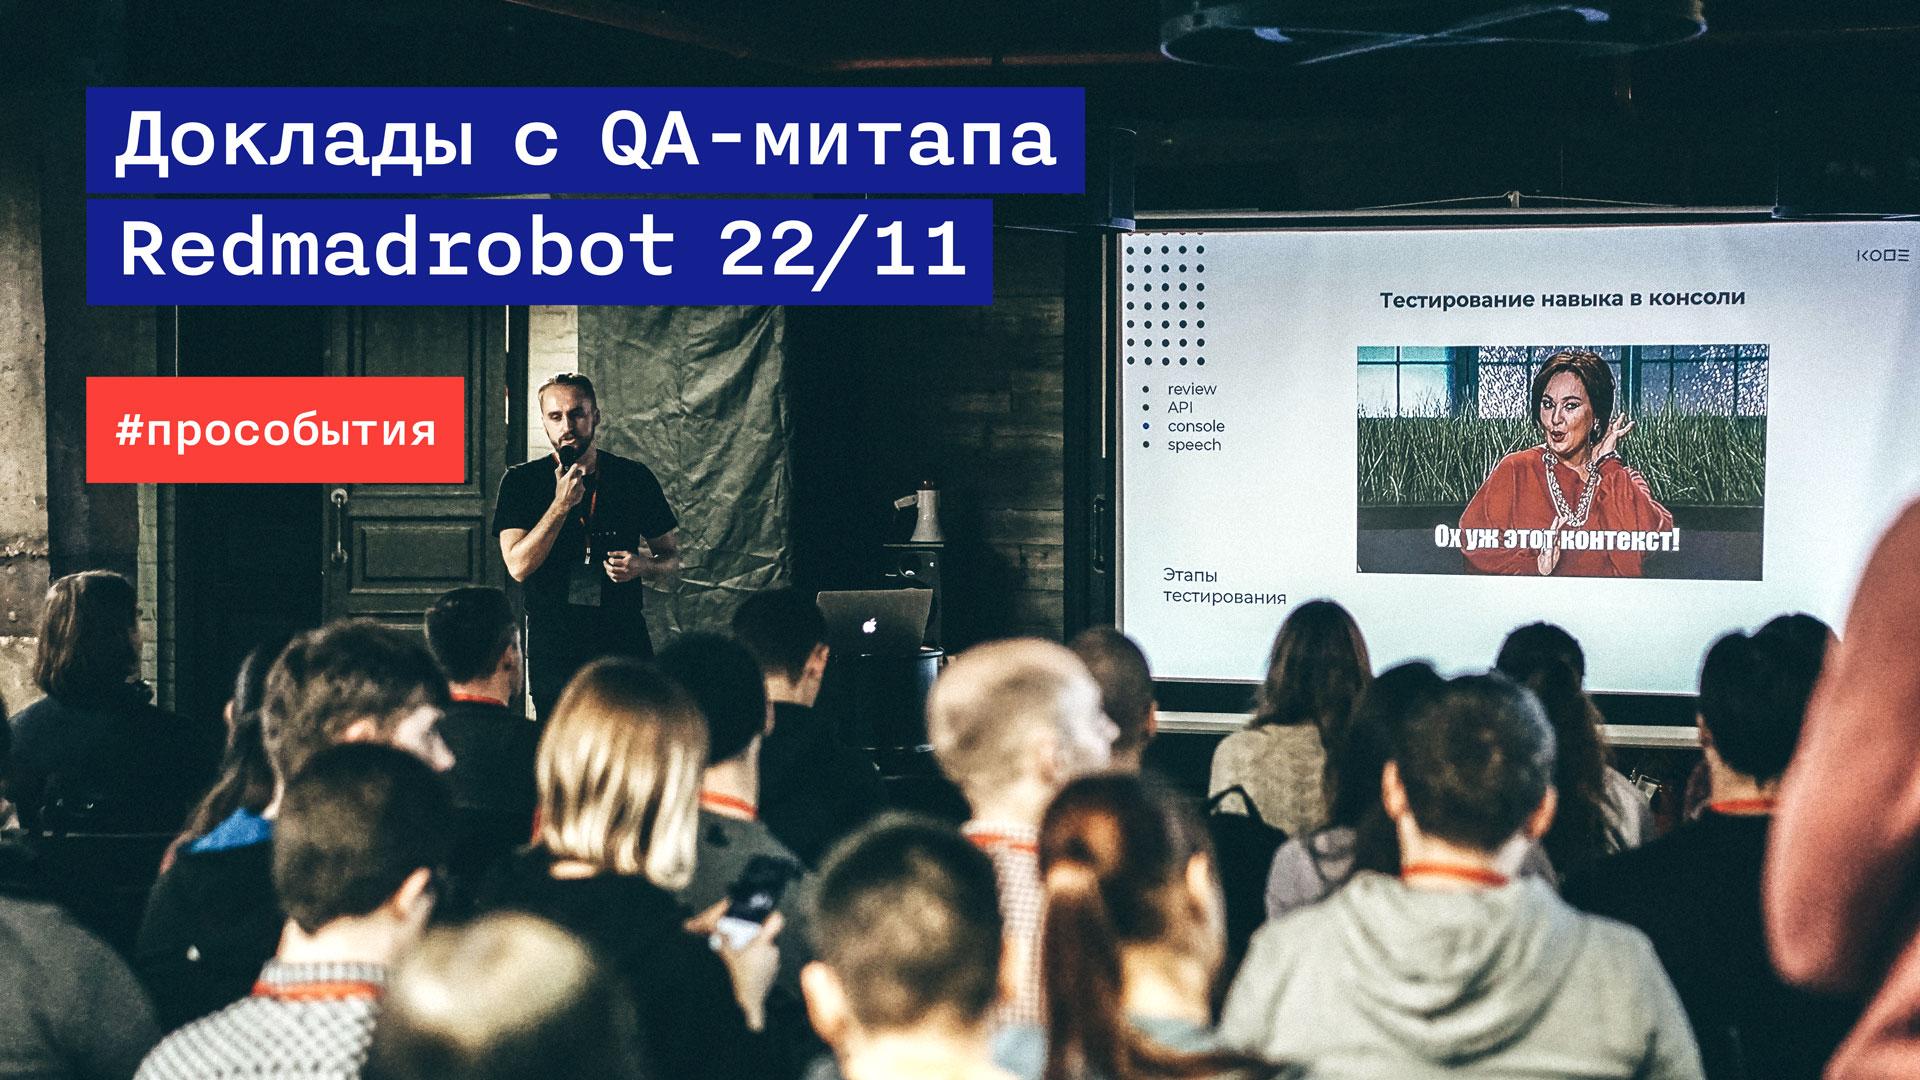 Записи докладов с QA-митапа Redmadrobot